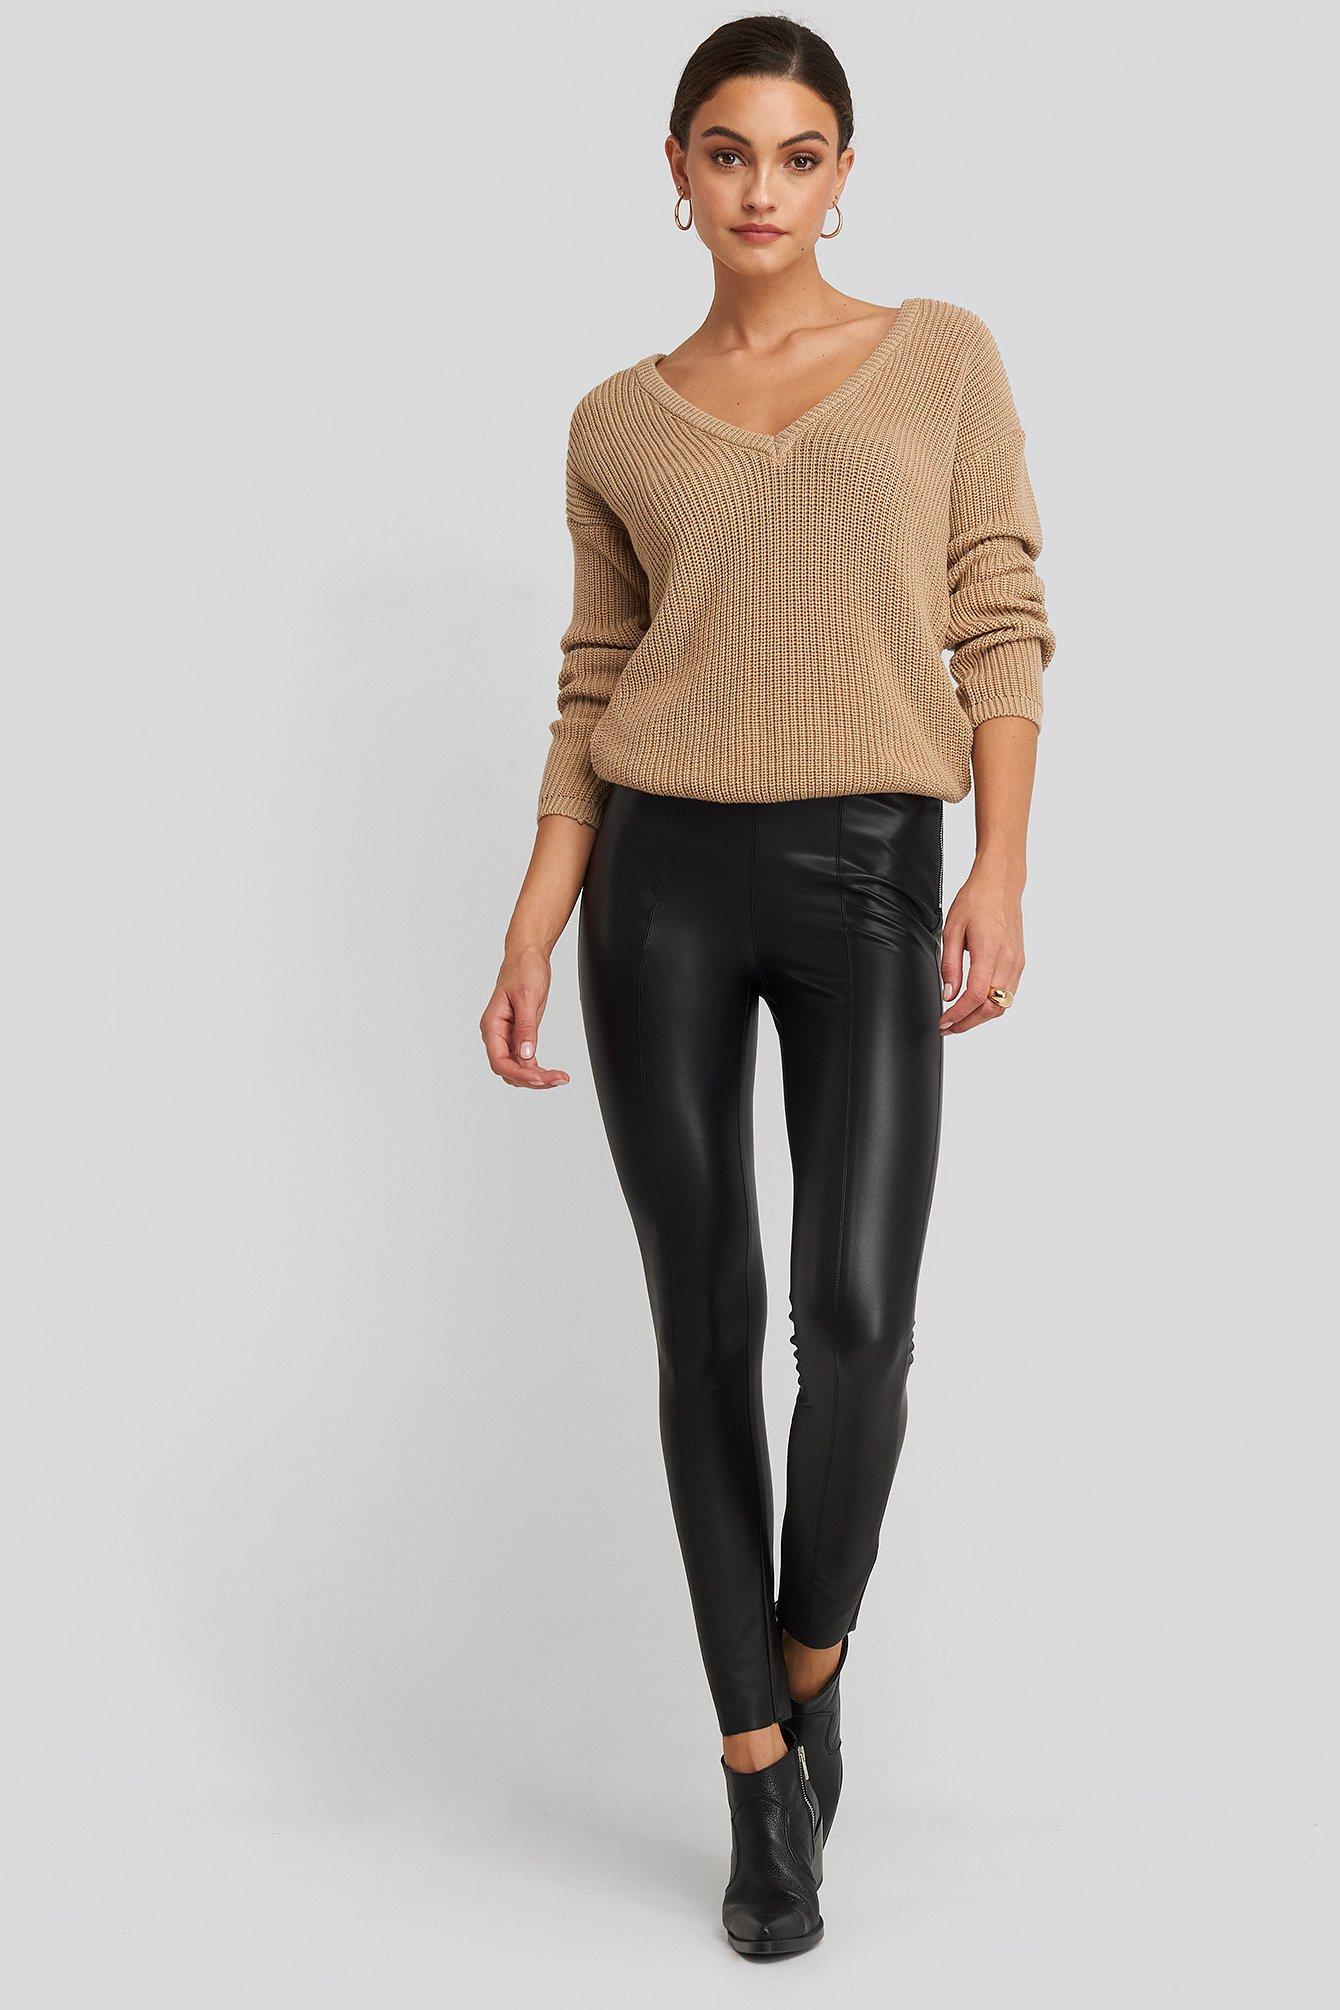 NA-KD Seam Detail PU Pants - Black